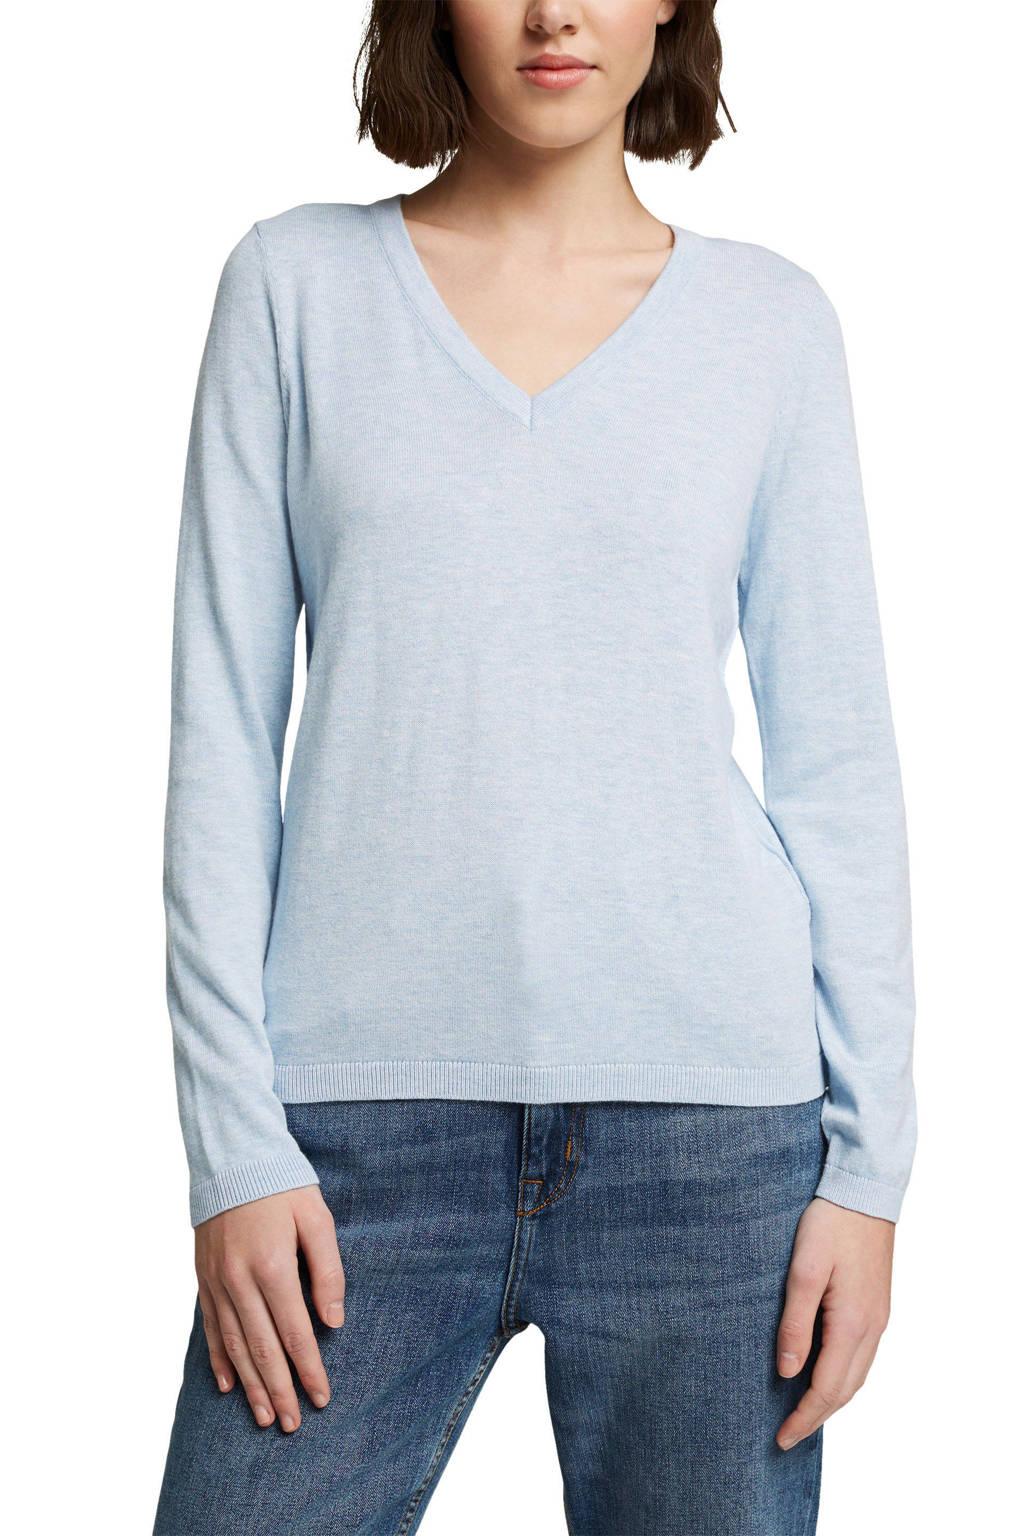 edc Women gemêleerde fijngebreide trui lichtblauw, Lichtblauw